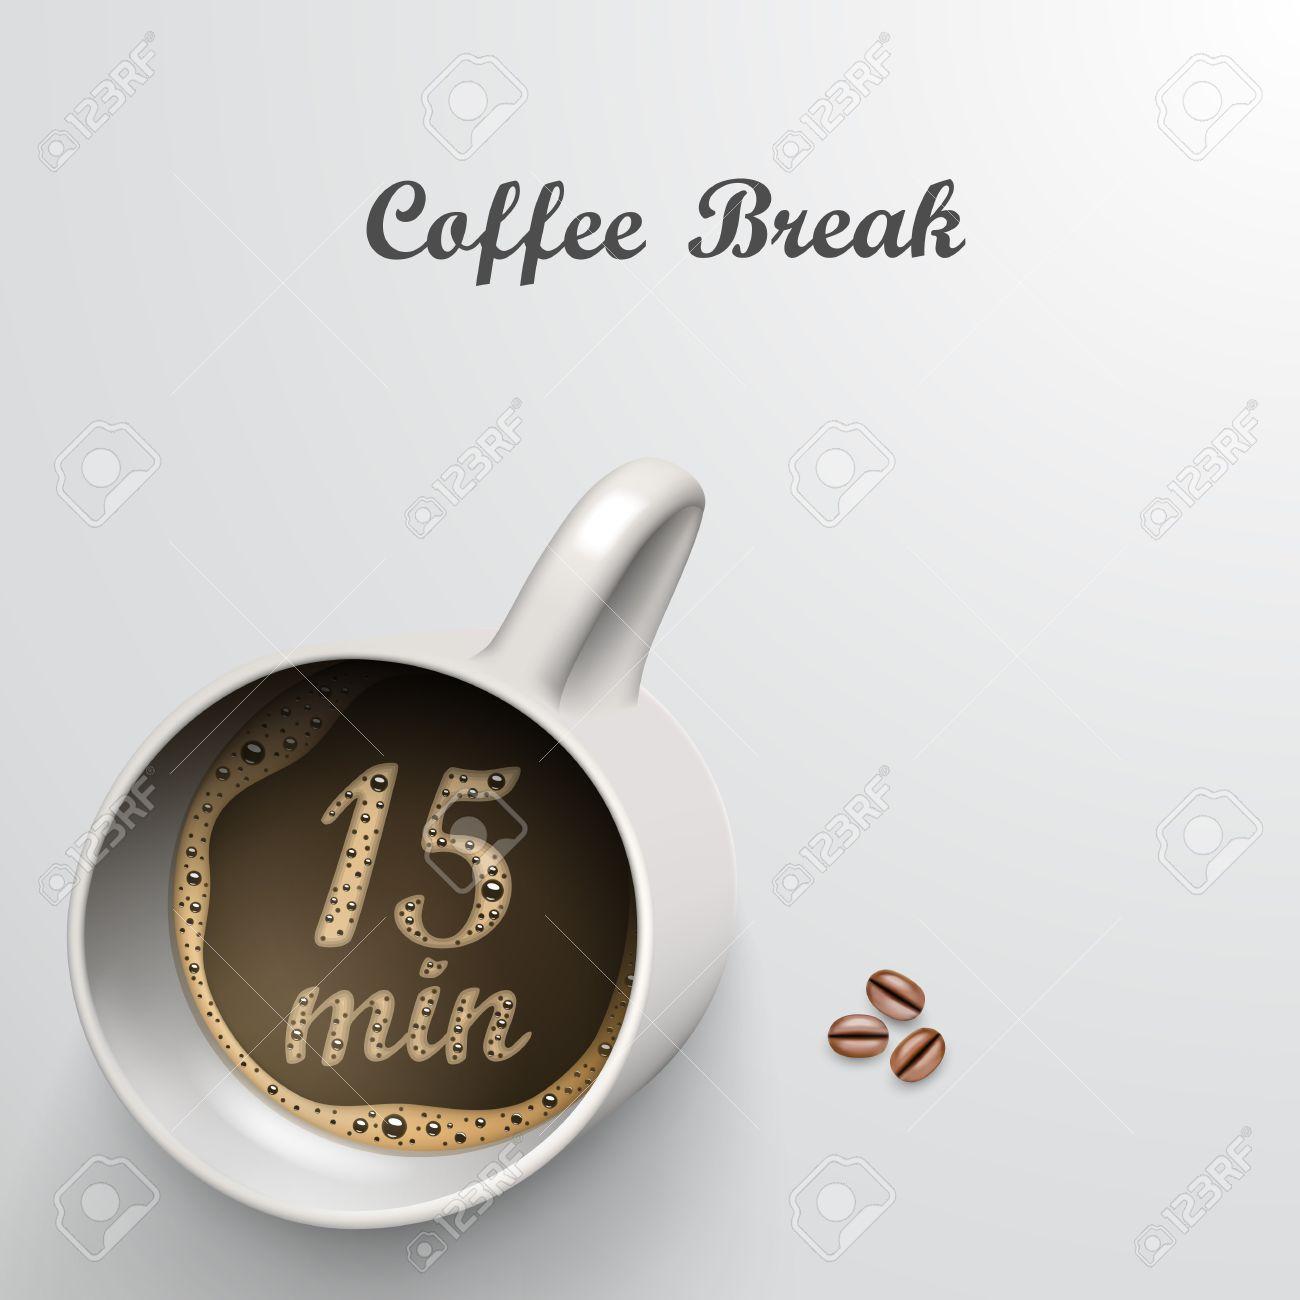 15 minutes break